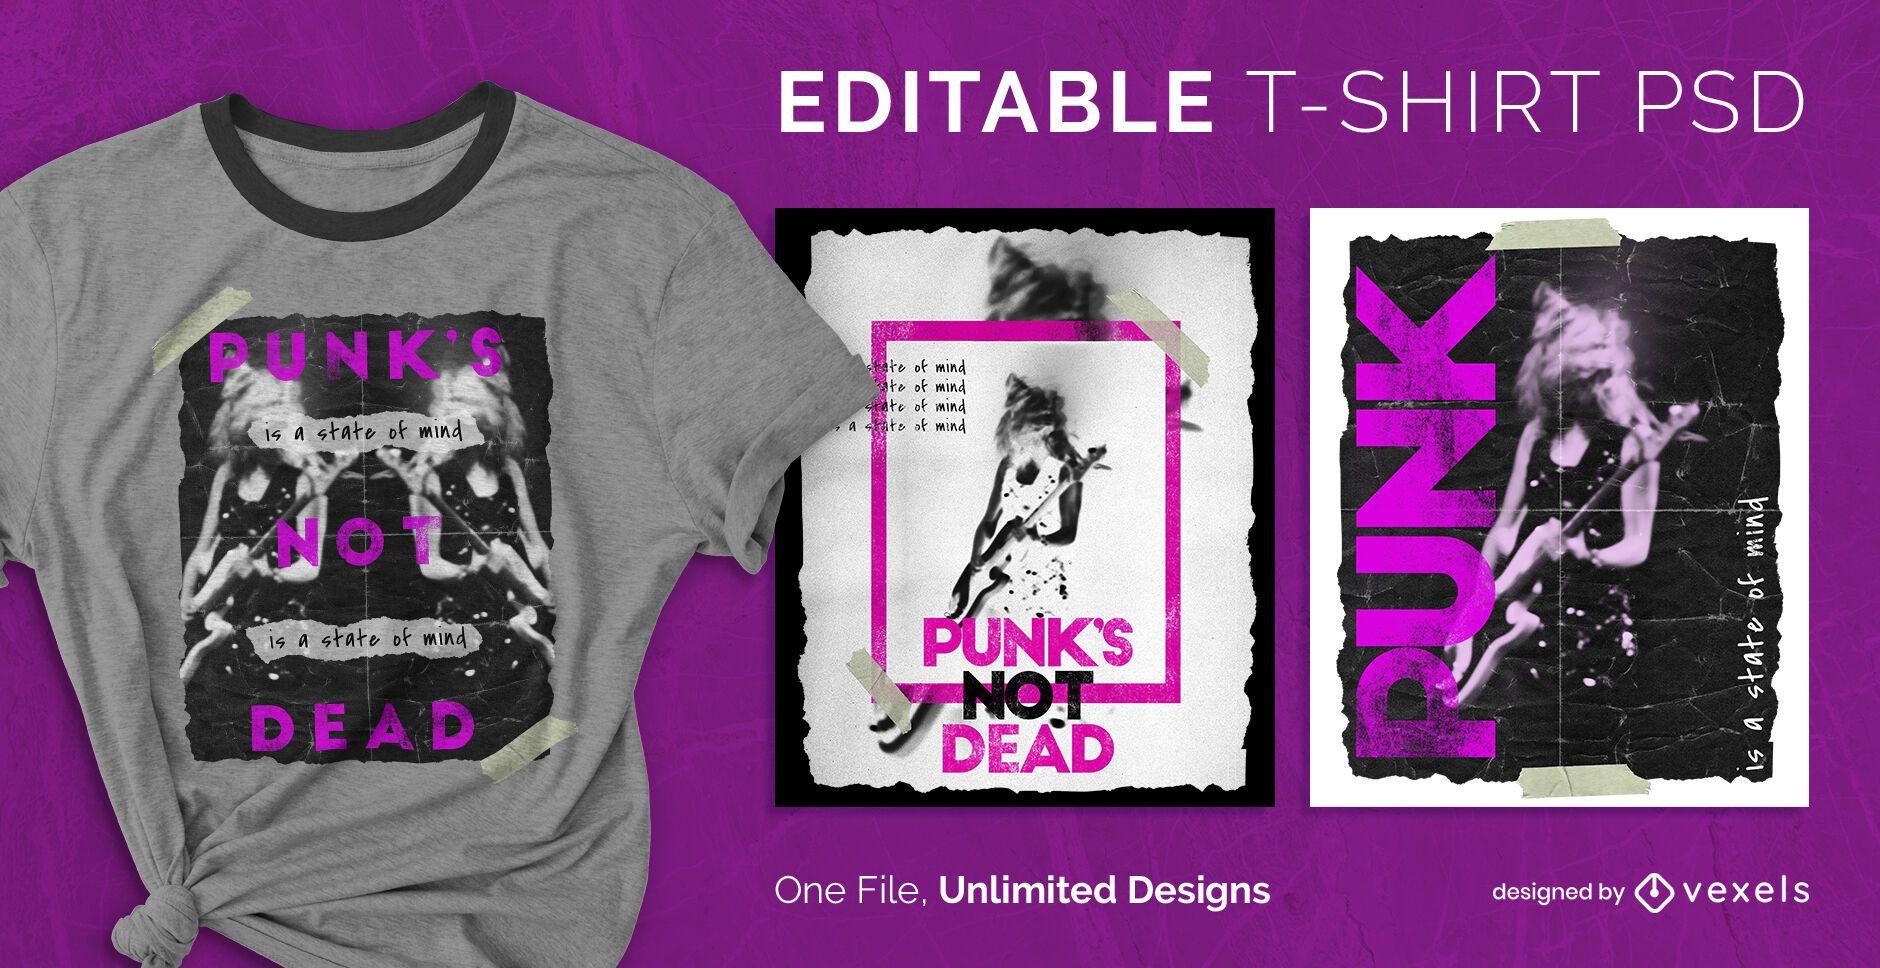 Punk rock photography scalable t-shirt psd